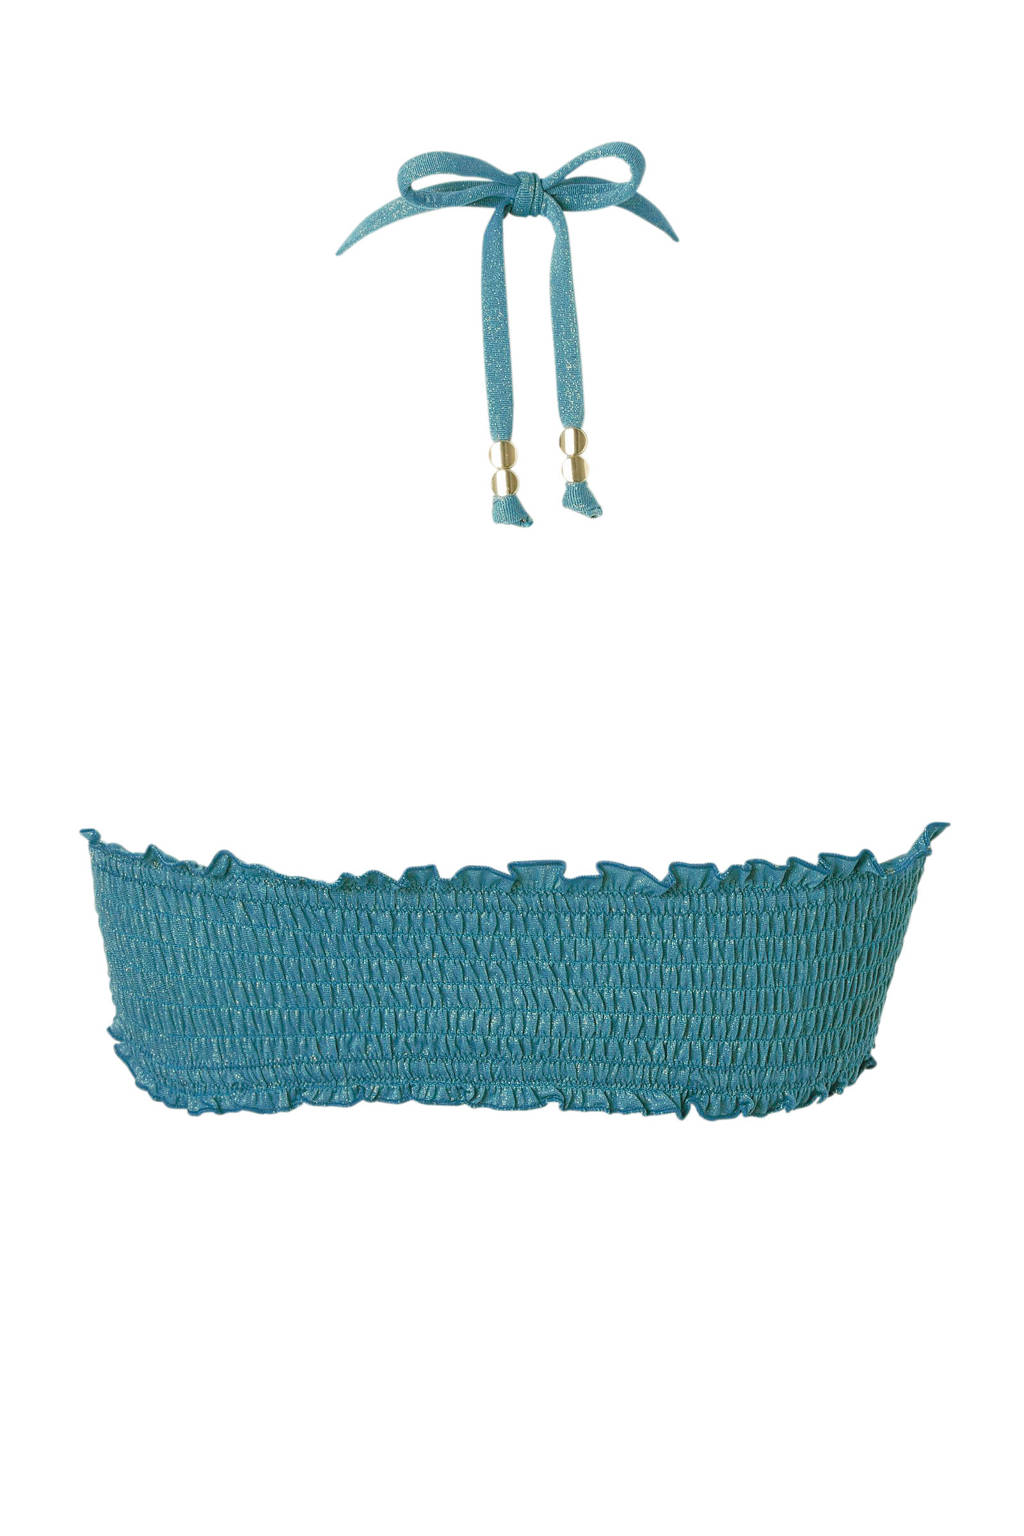 Glitters Goudkleurige Bikinitop Whkmp's Beachwavebandeau Groen Met wIqcRW1fHx